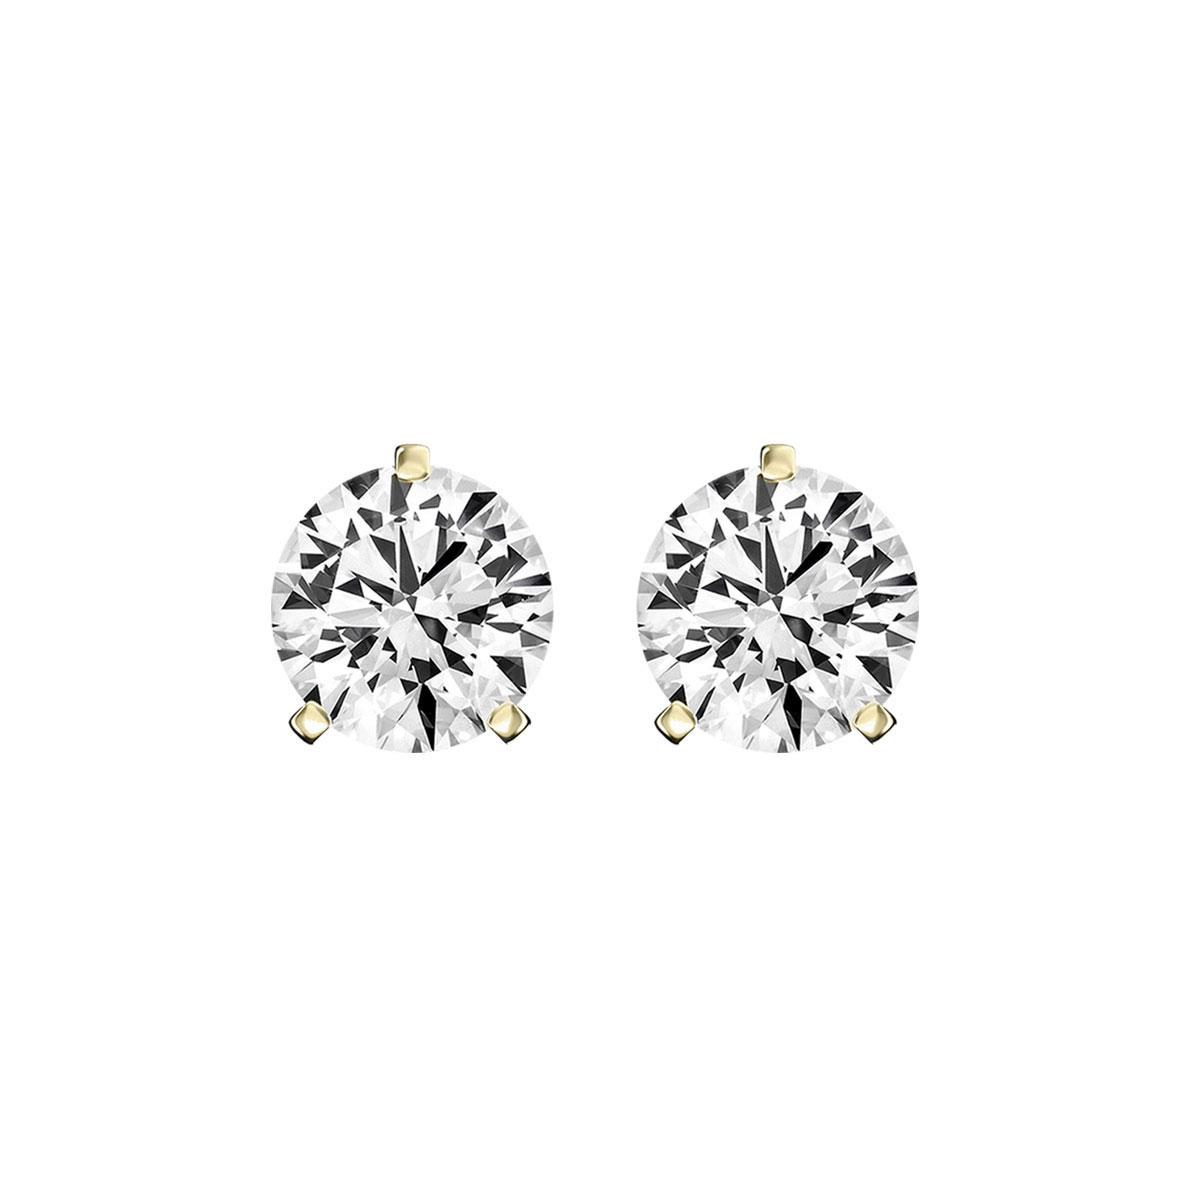 14K Yellow Gold Diamond Stud Earrings ( 1/5 ct. tw)